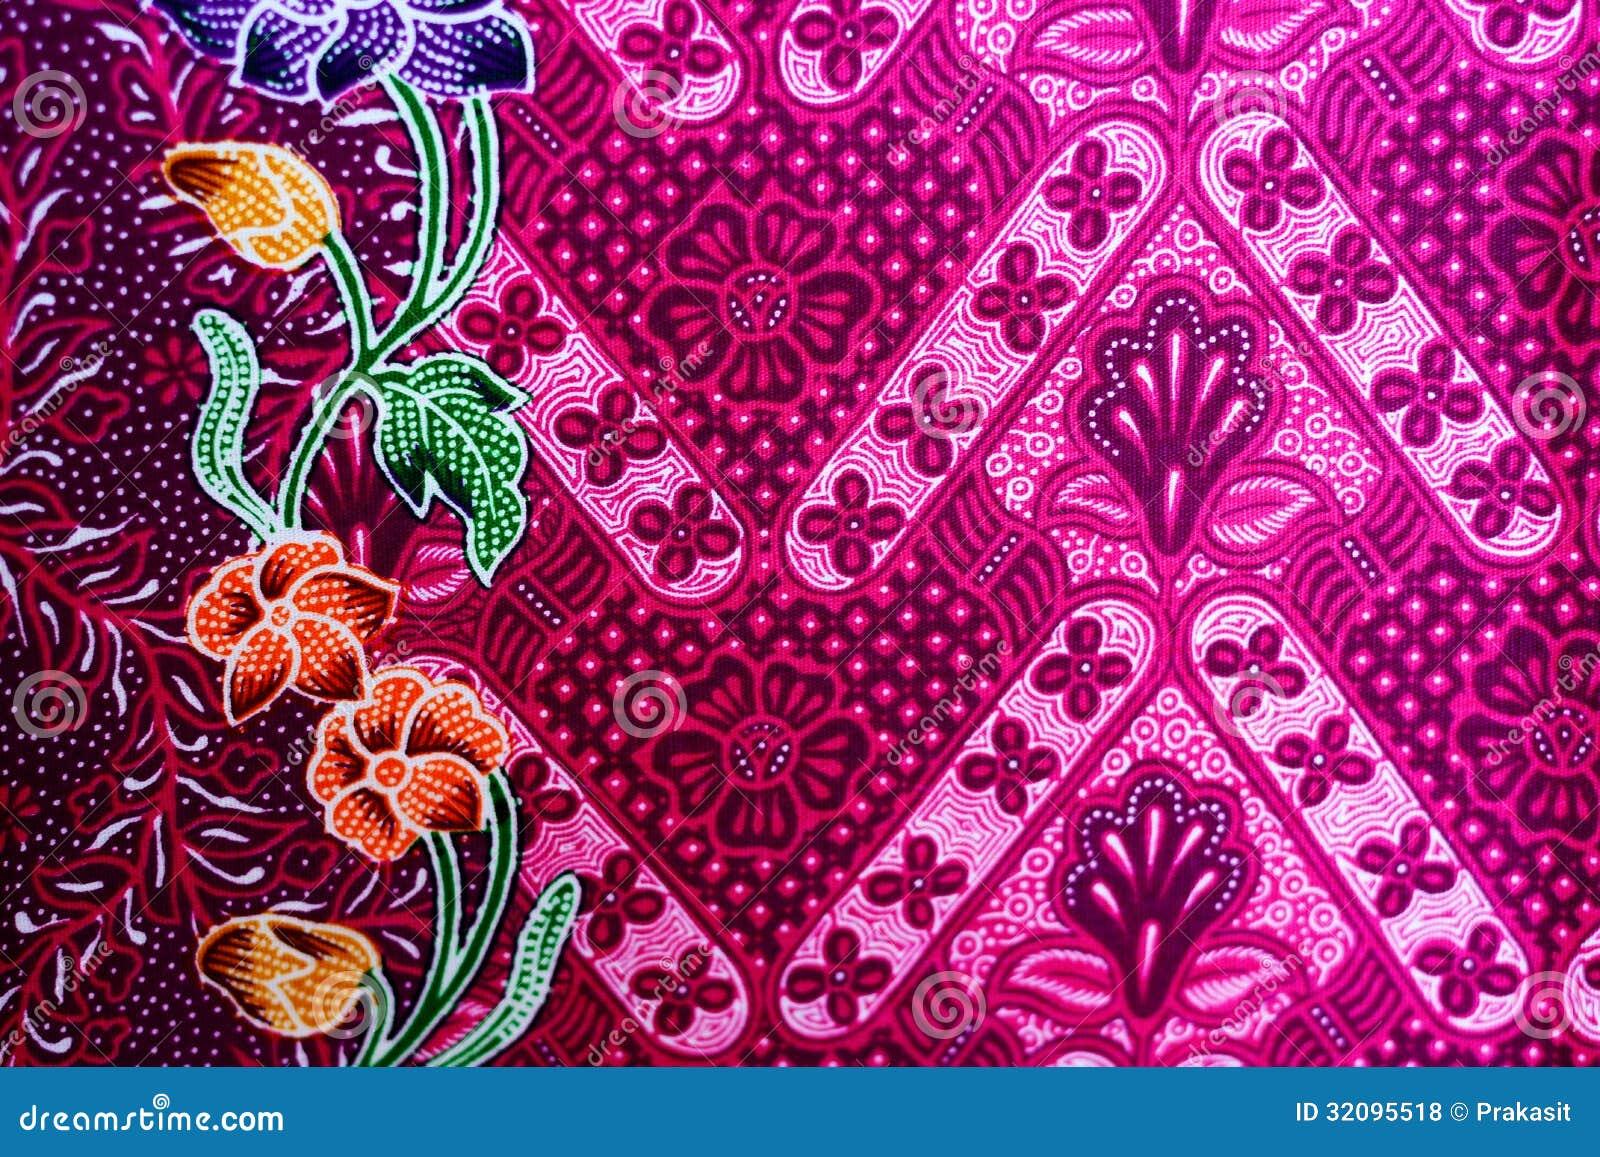 Colorful Batik Cloth Fabric Background Royalty Free Stock